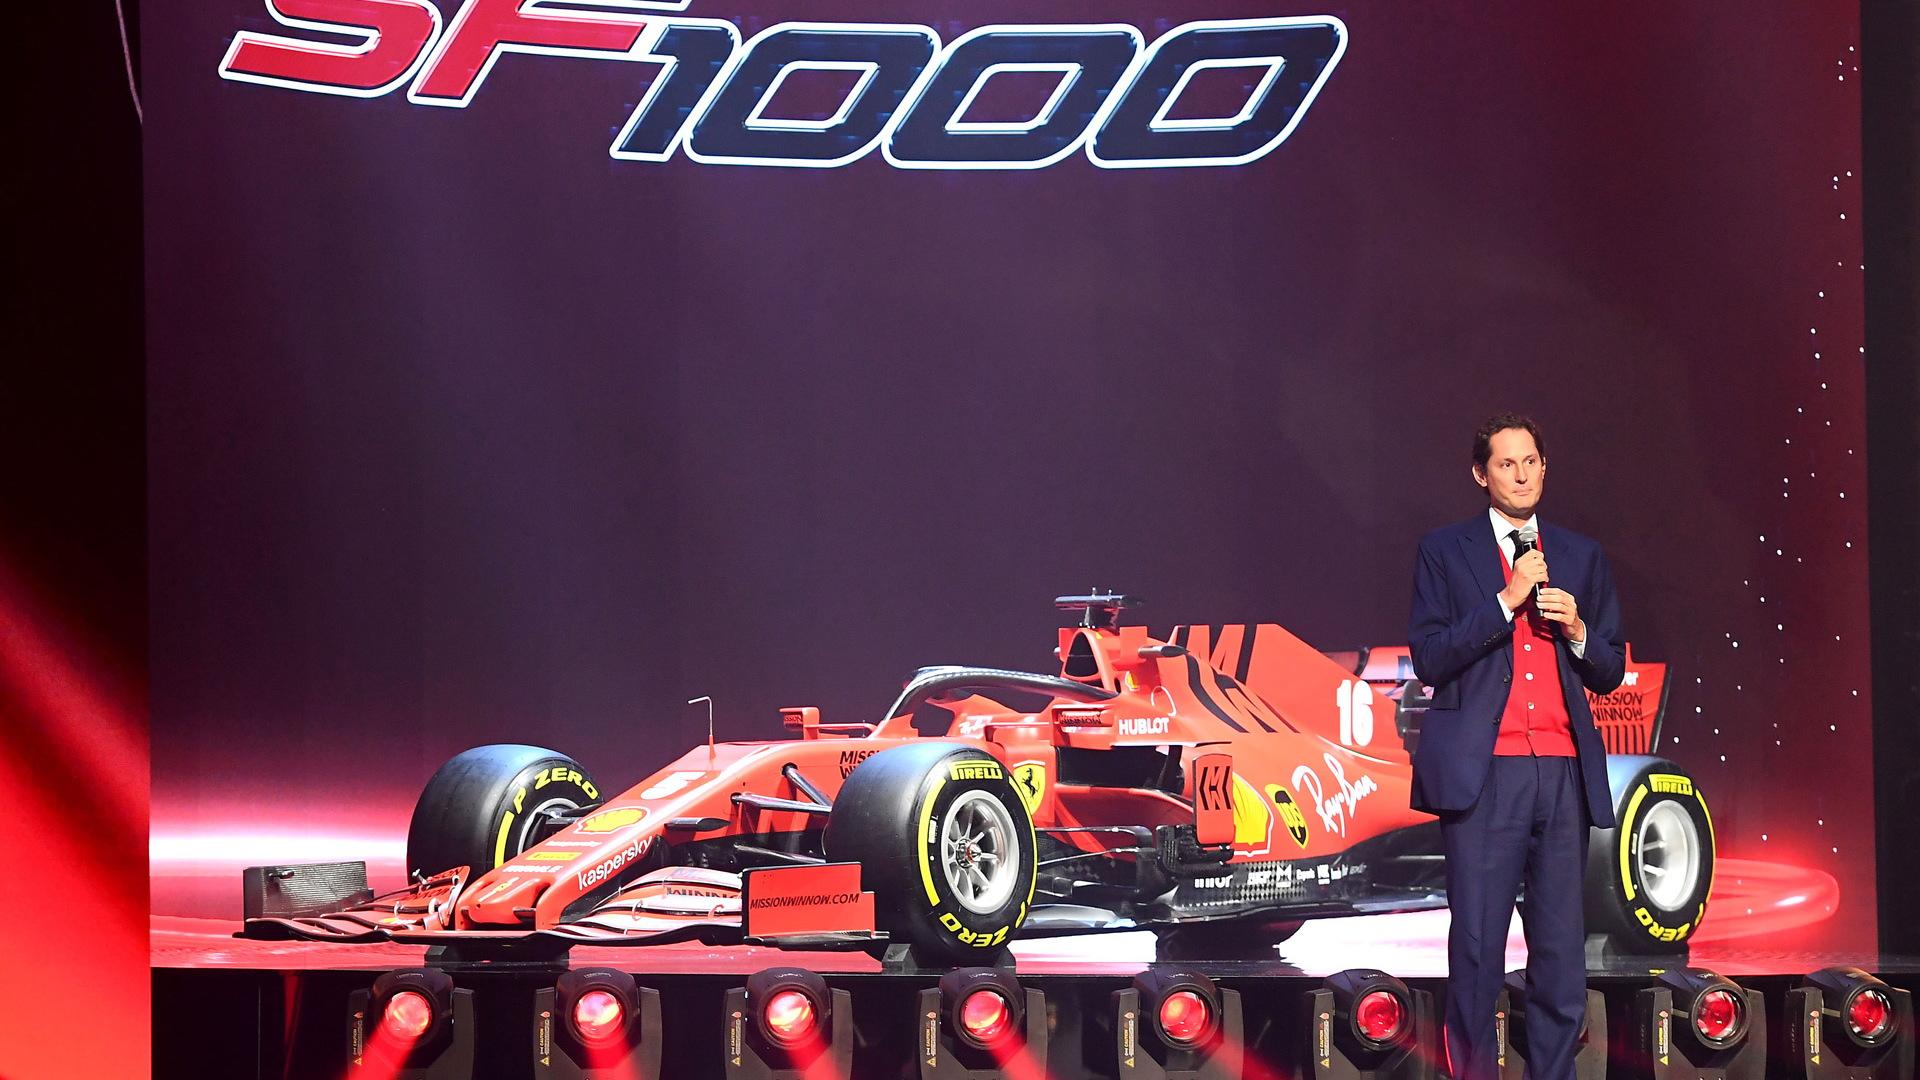 ferrari's 2020 f1 car revealed as the sf1000